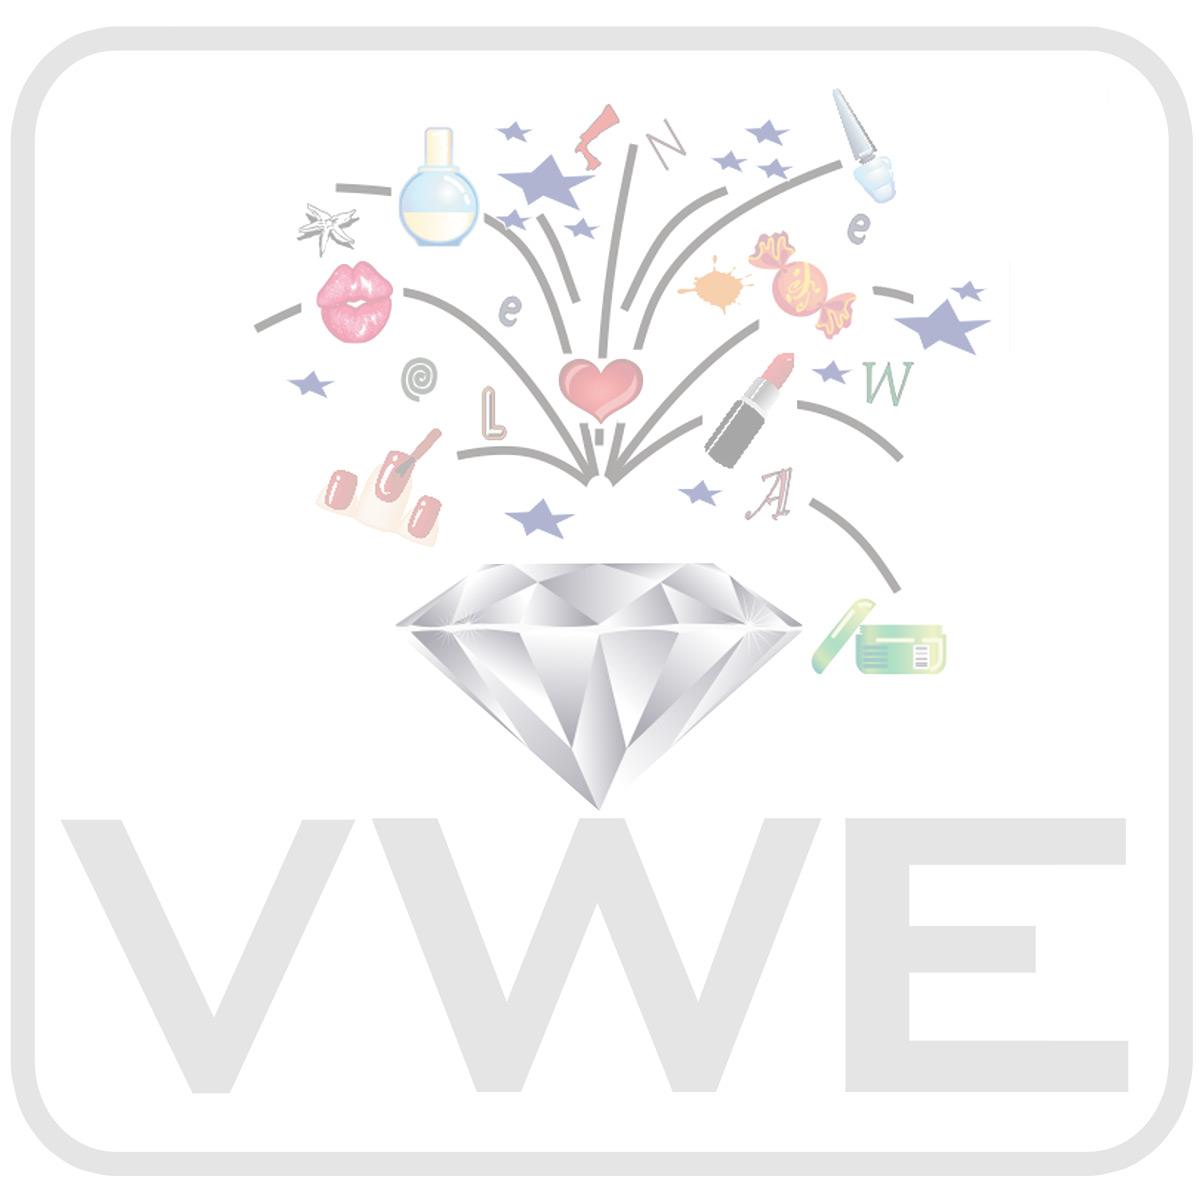 UV Gel Flux Silver Diamond - GFSD-15 - 15ml  [1 / 2]